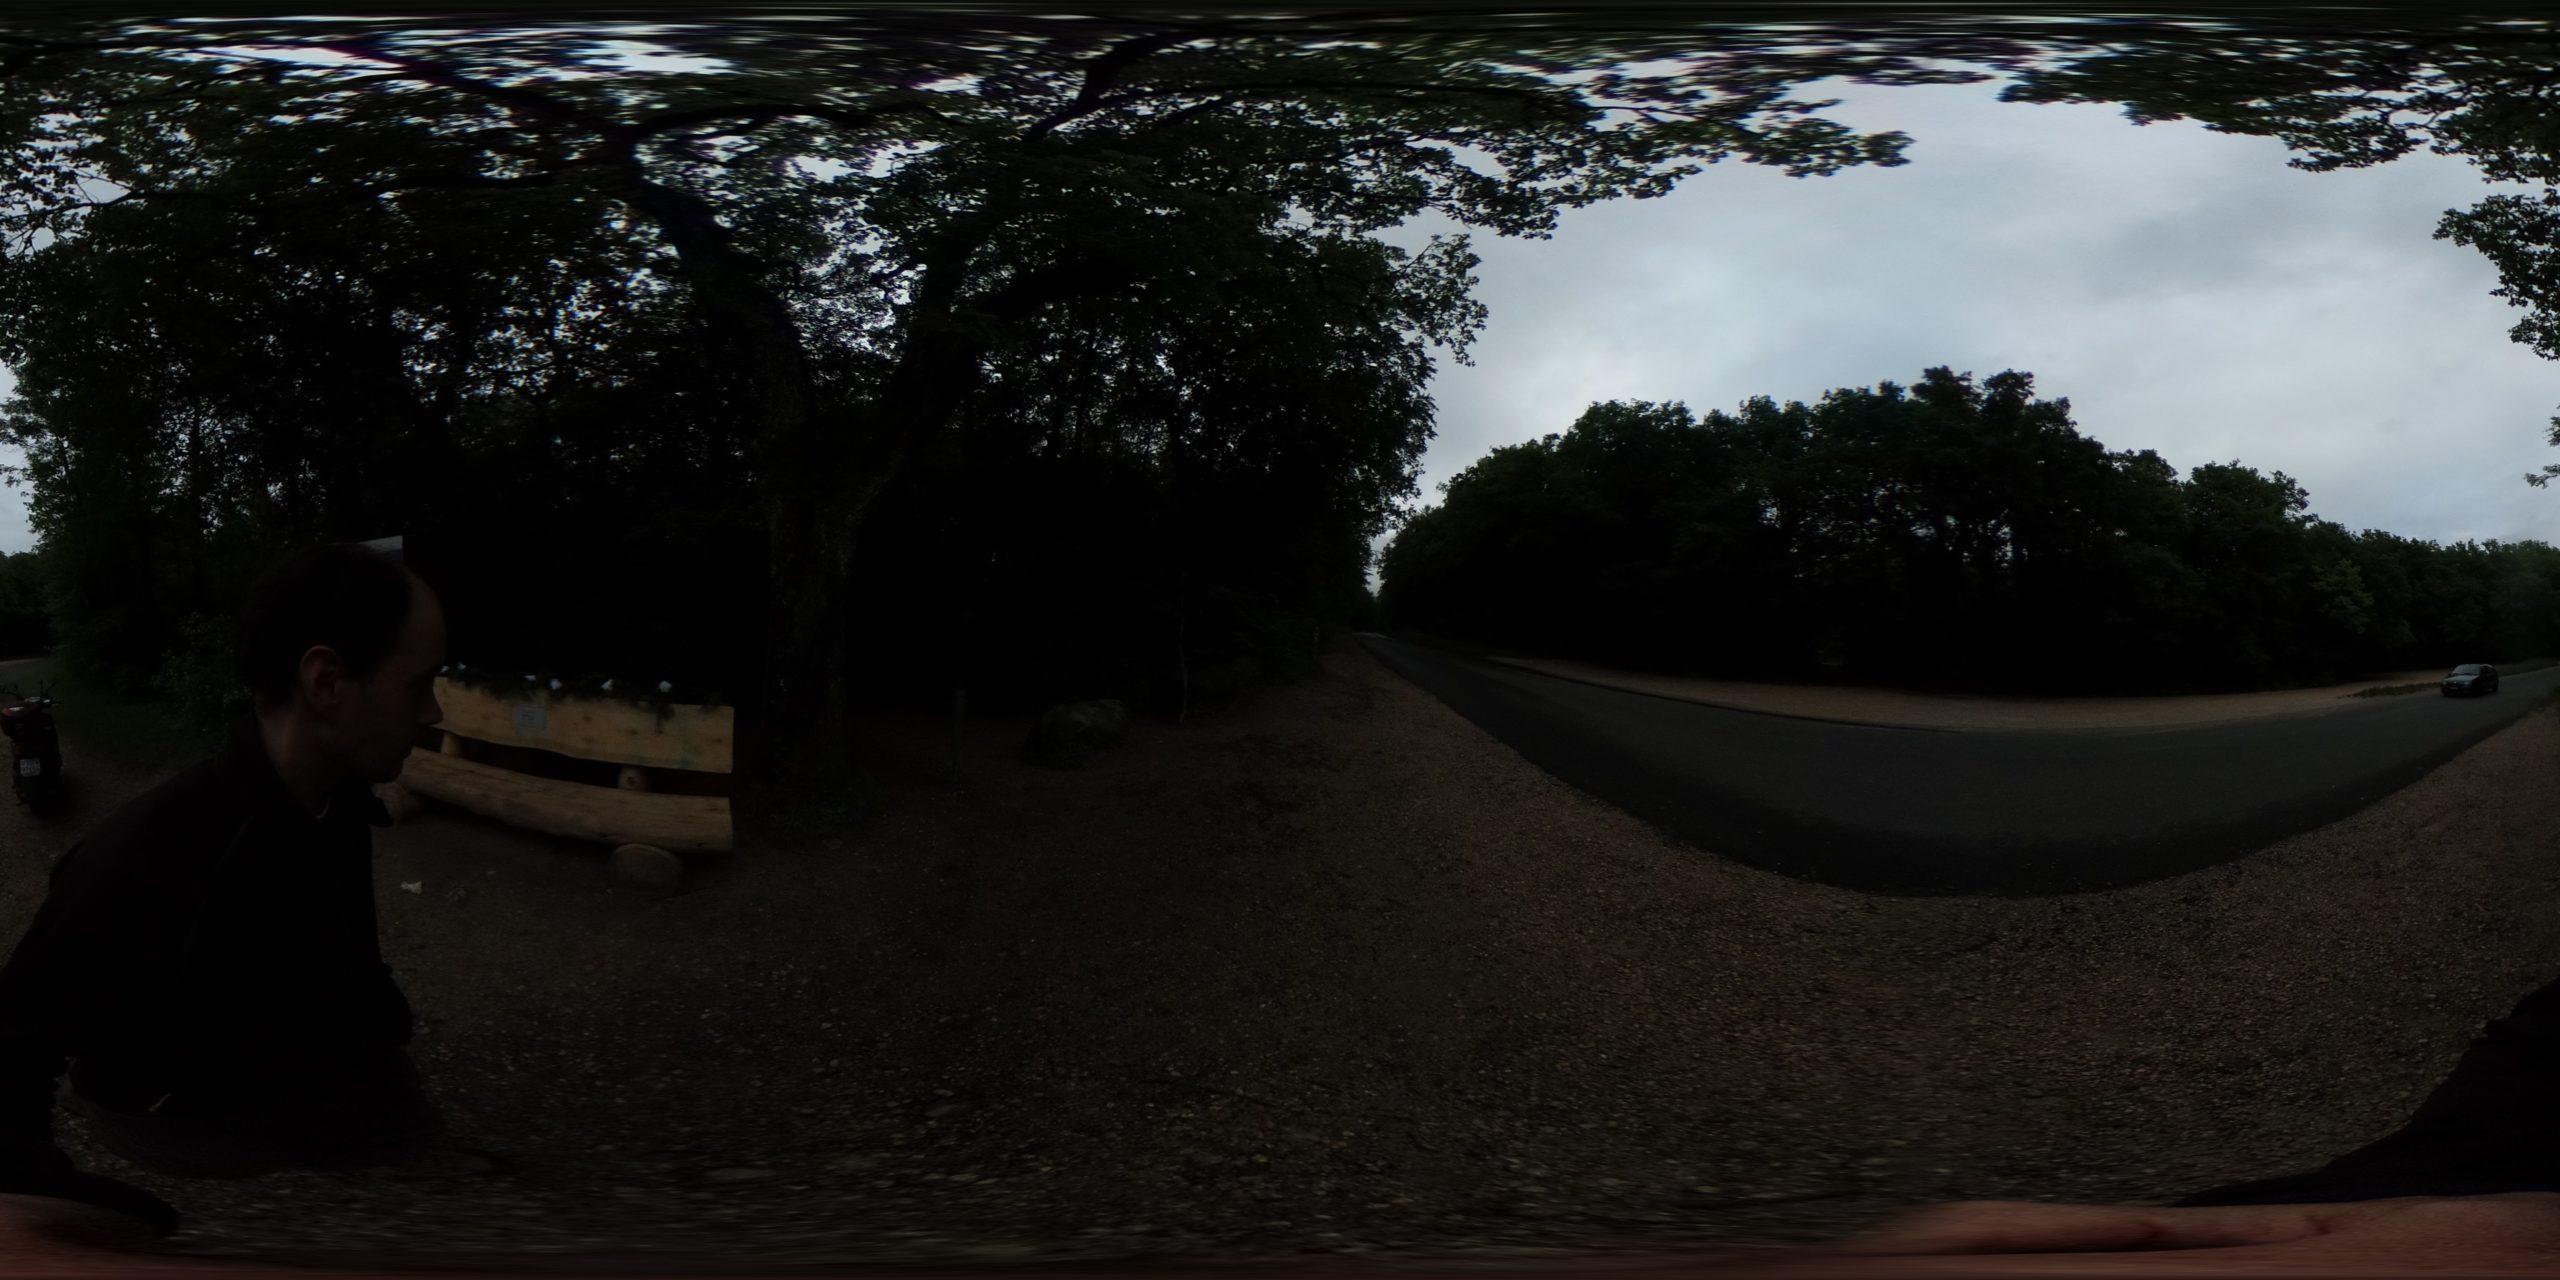 360 walk